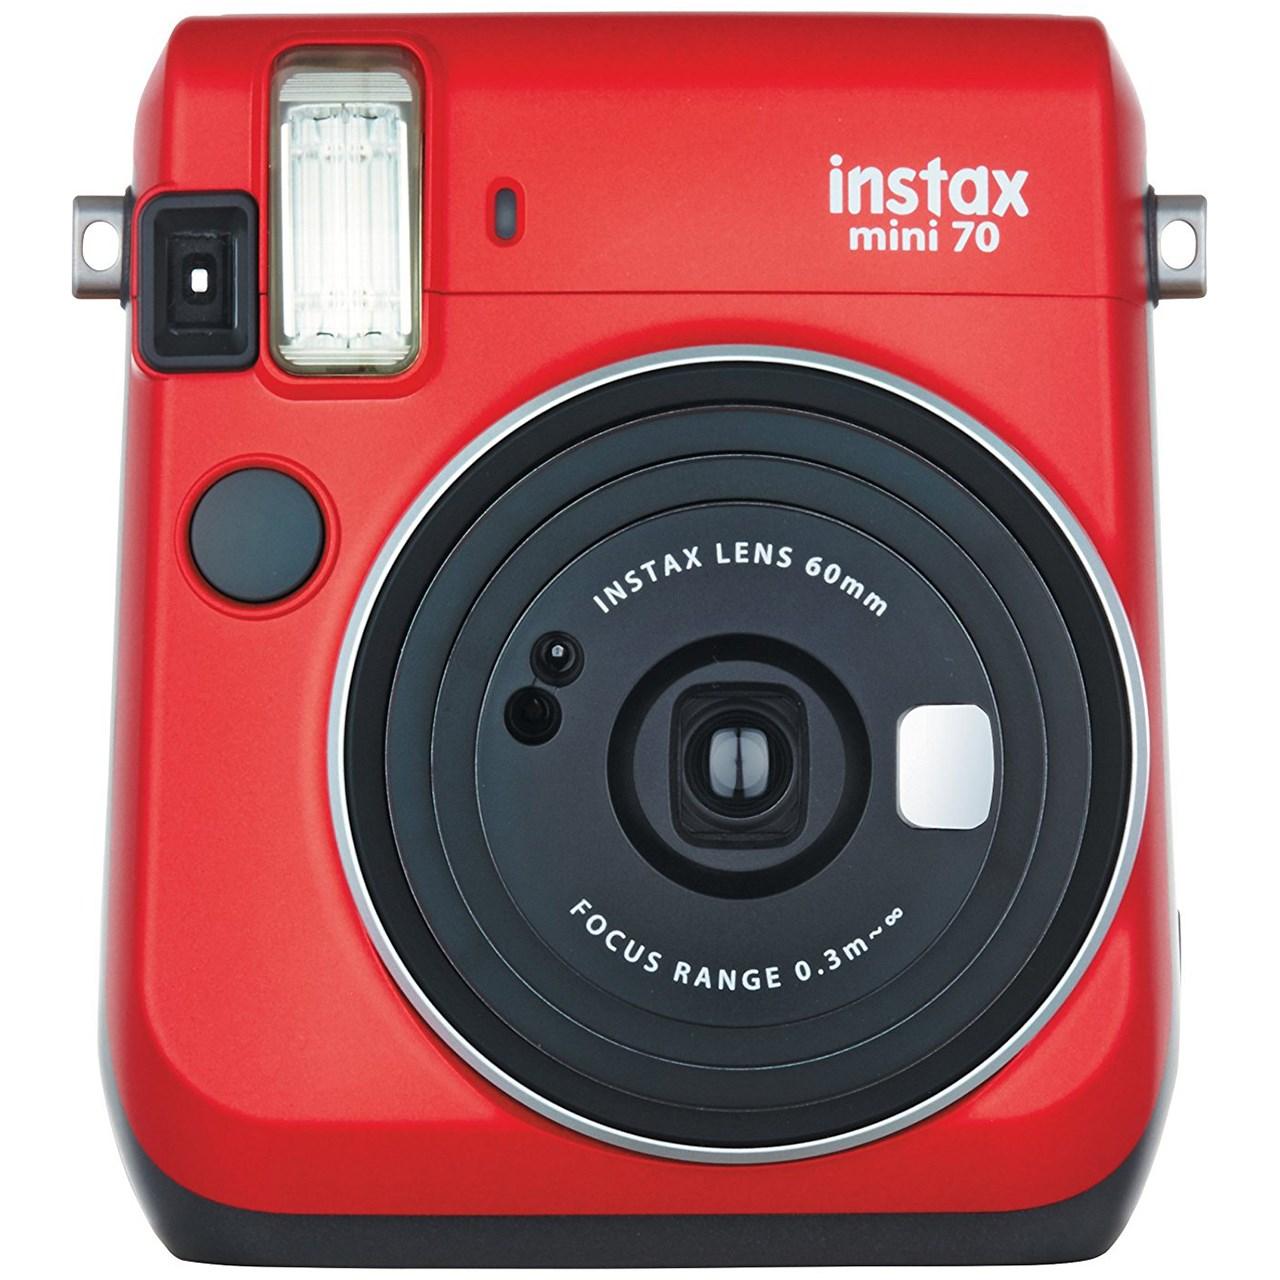 دوربين عکاسي چاپ سريع فوجي فيلم مدل Fujifilm Instax mini 70 Digital Camera